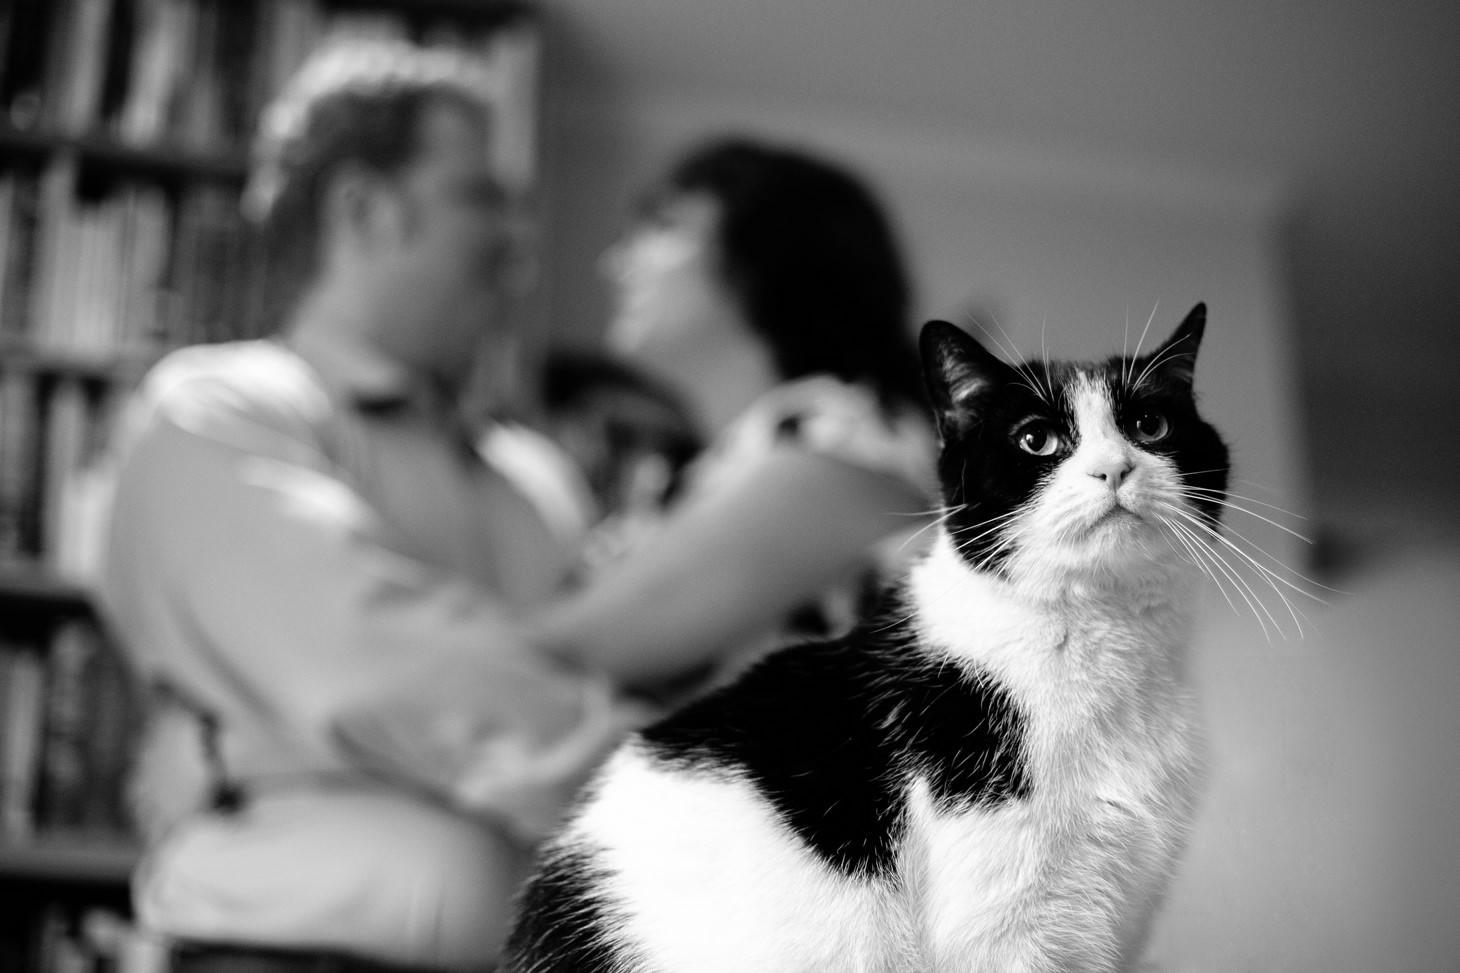 006-nyc-wedding-photographer-smitten-chickens-east-village-engagement-cats.jpg